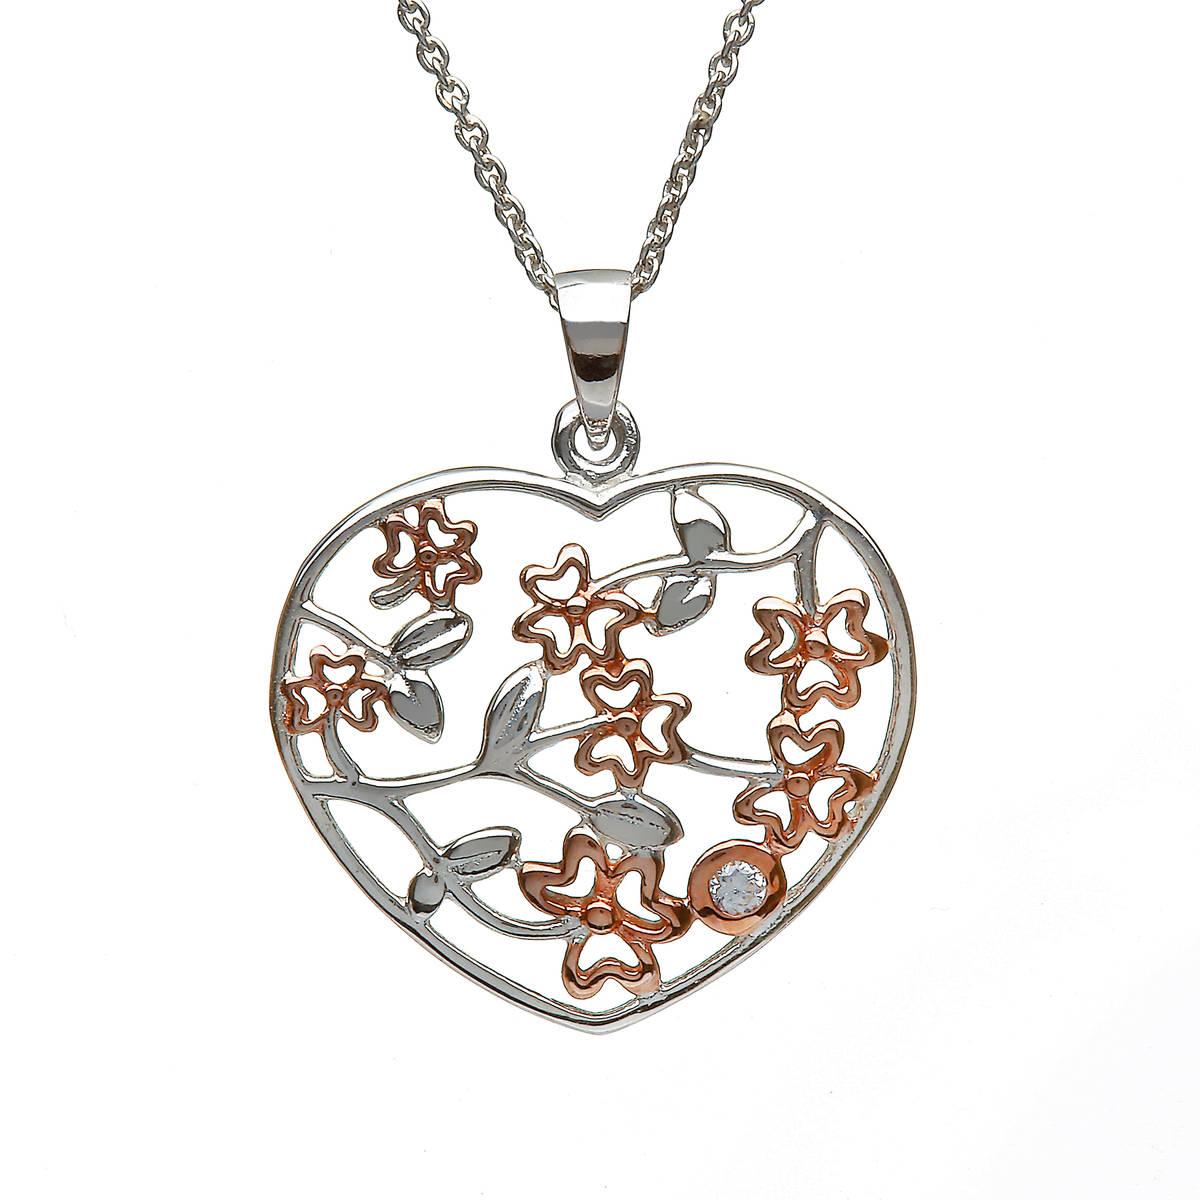 Silver Heart Pendant With Shamrocks Centre Cz